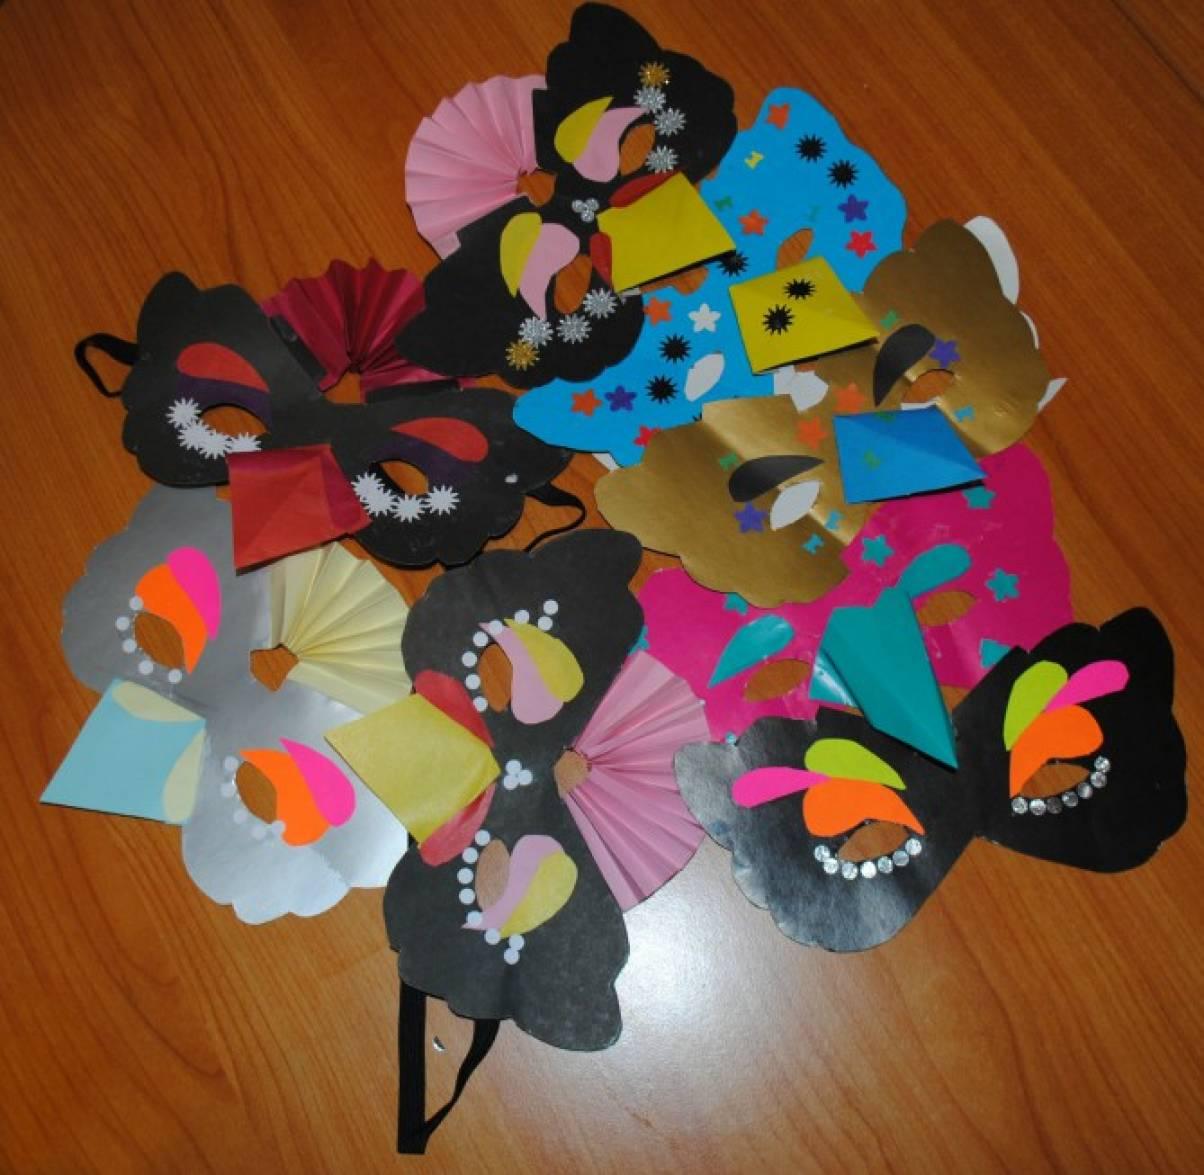 Детские новогодние маски синички картинки